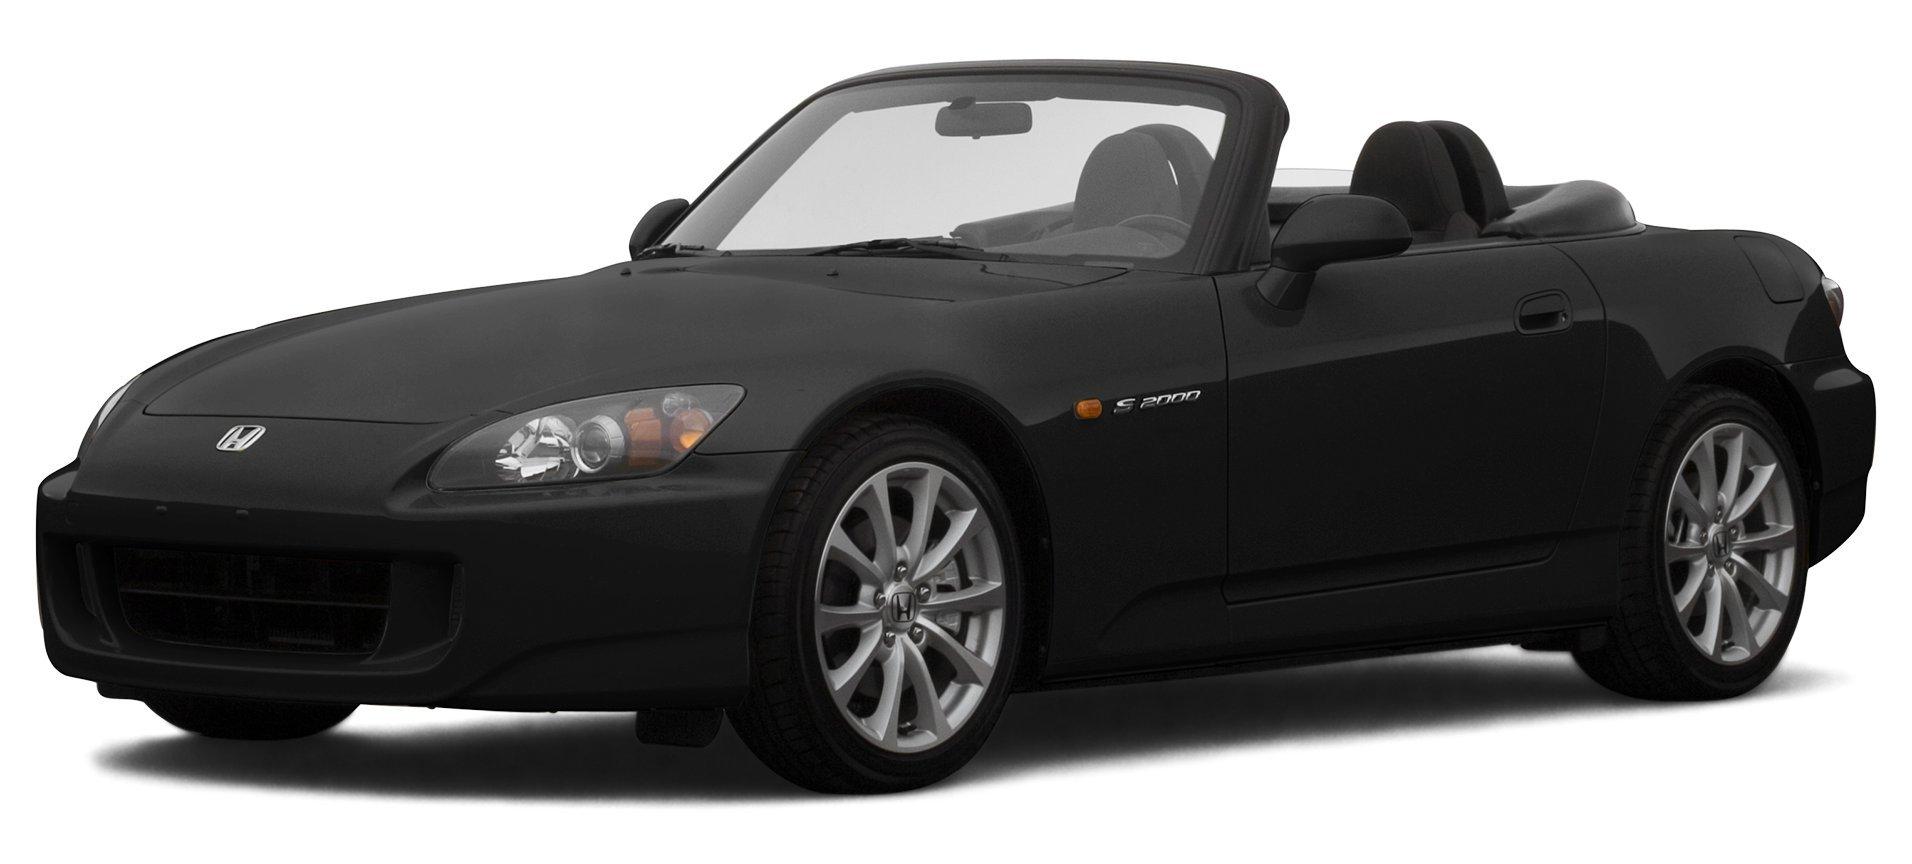 2 Door Convertible >> Amazon Com 2007 Honda S2000 Reviews Images And Specs Vehicles